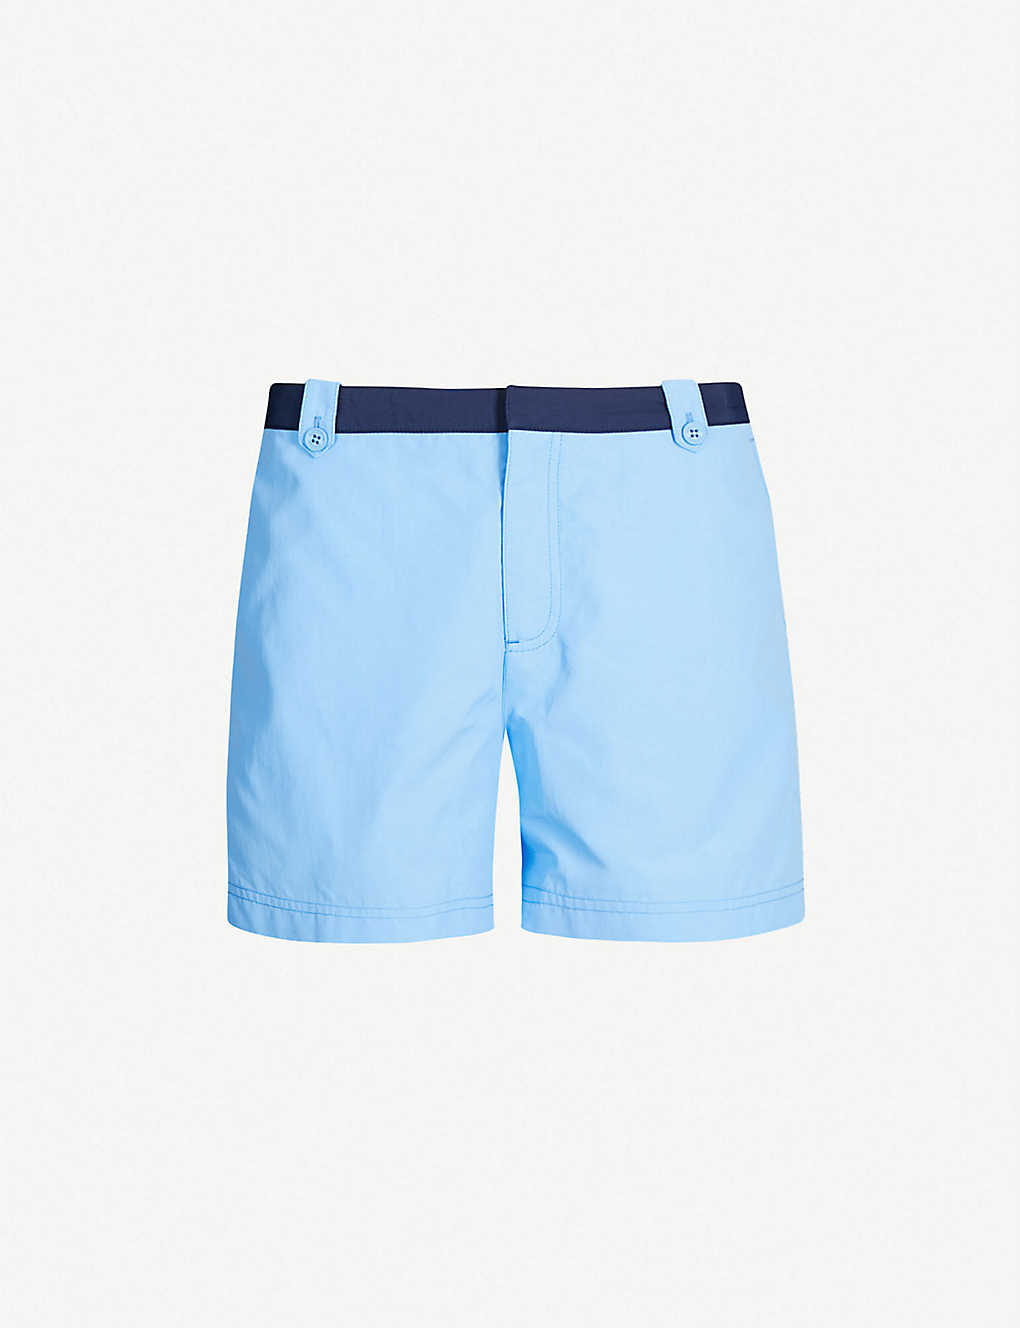 d885c4b689225 ORLEBAR BROWN - x James Bond Setter Thunderball swim shorts ...